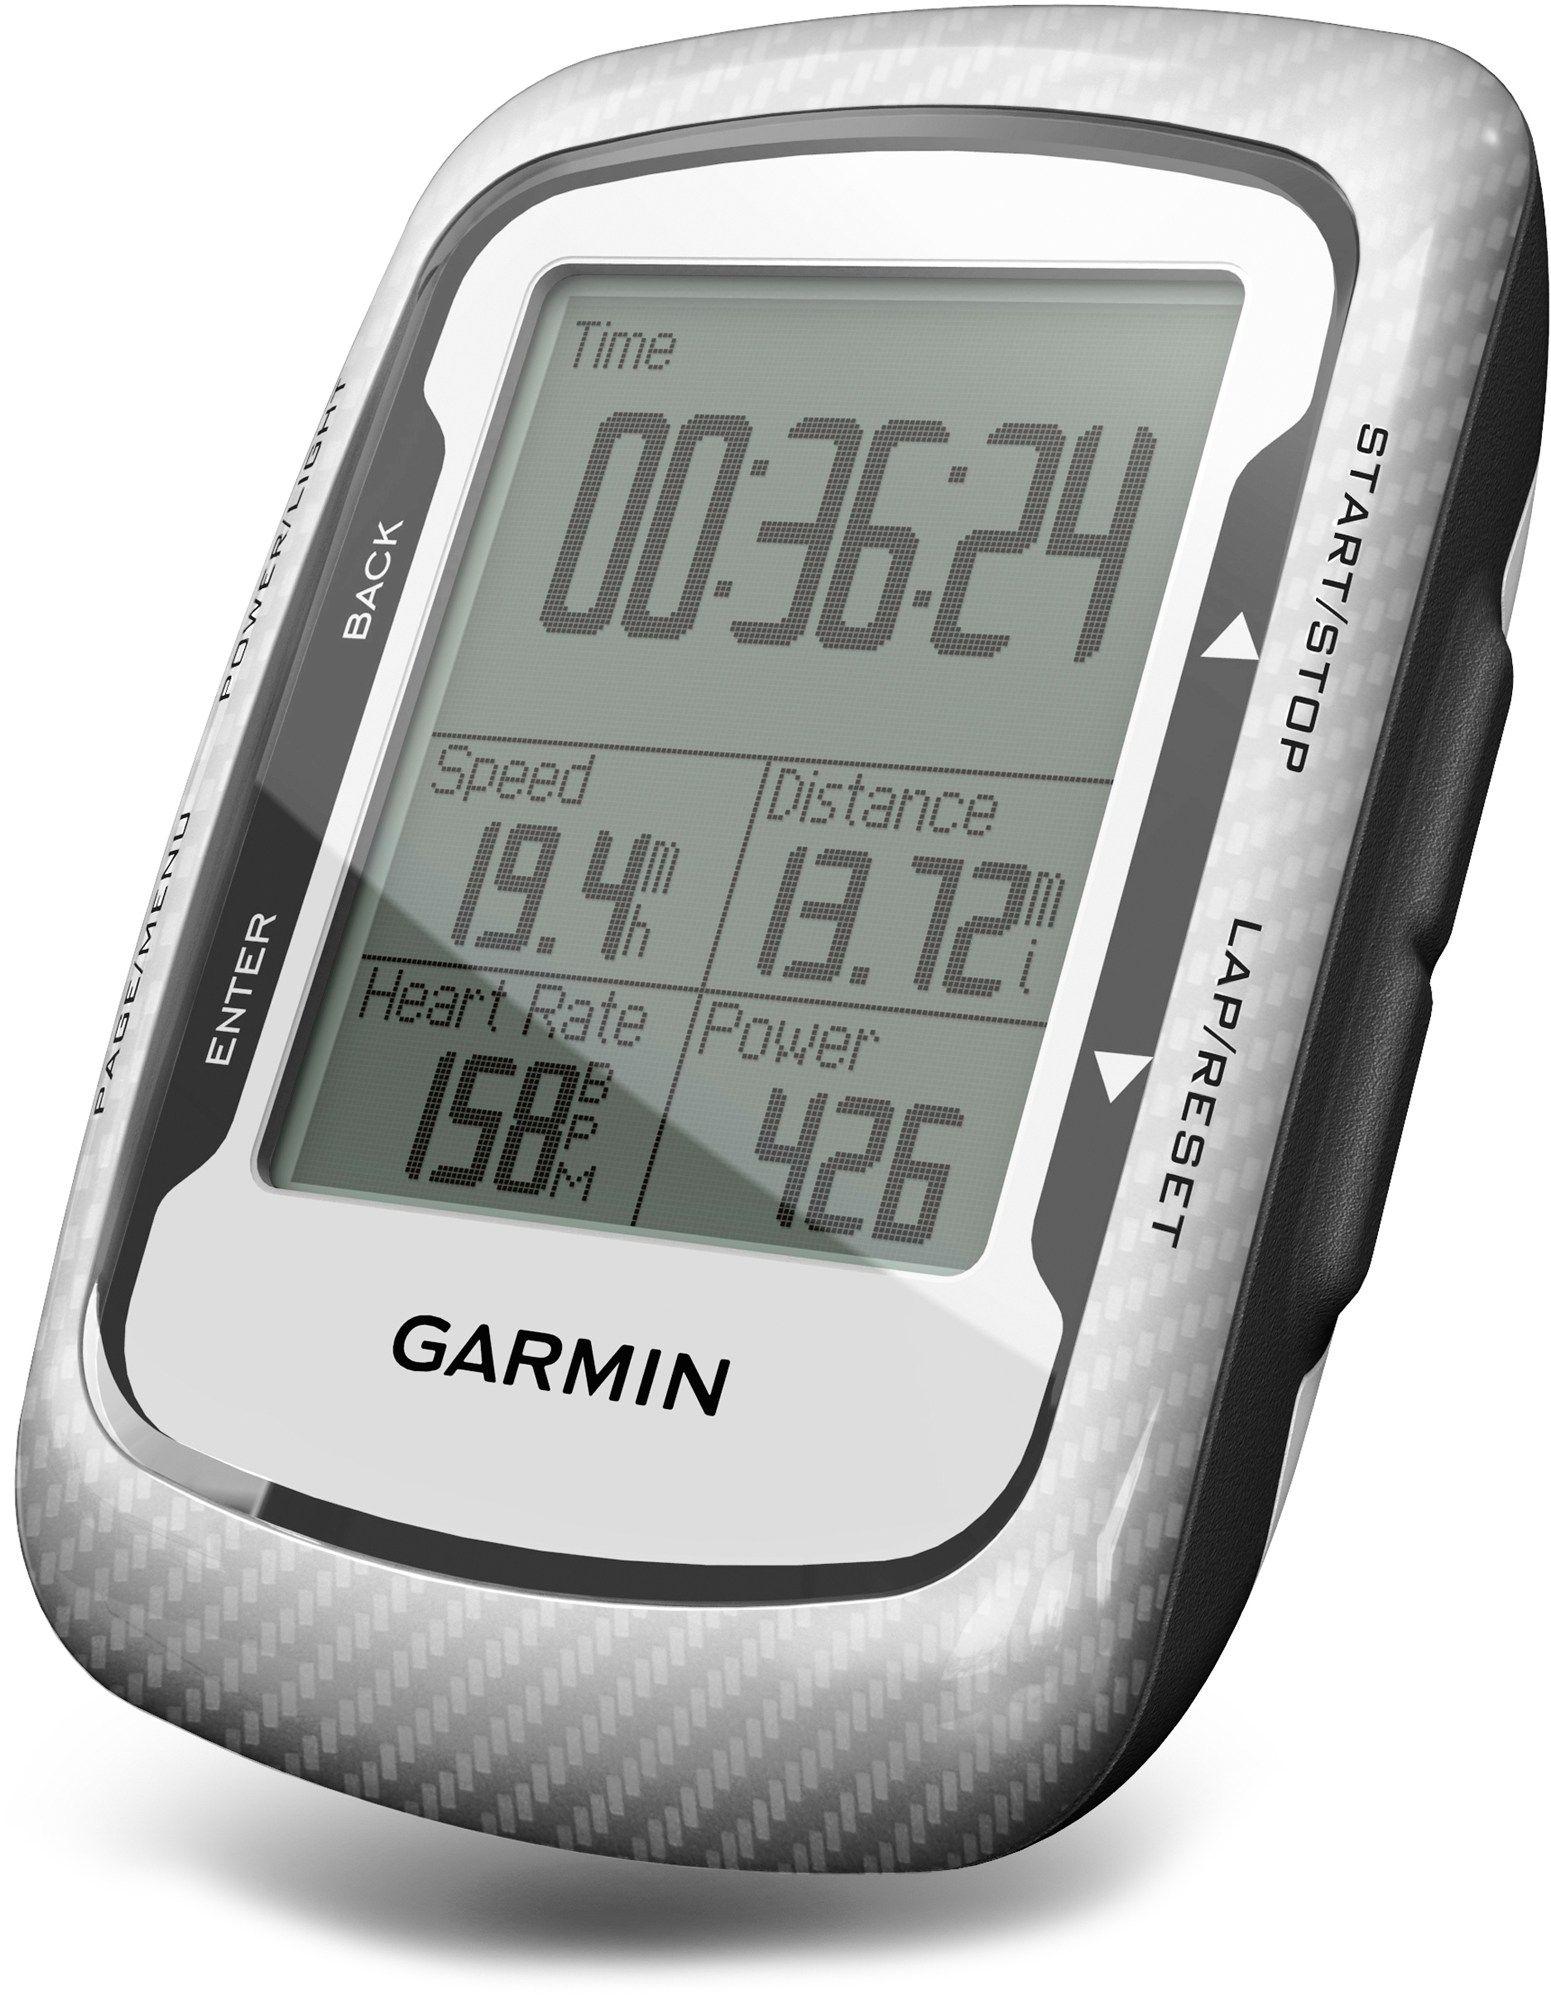 Garmin Edge 500 Wireless Bike Computer Rei Co Op Gps Bike Cycling